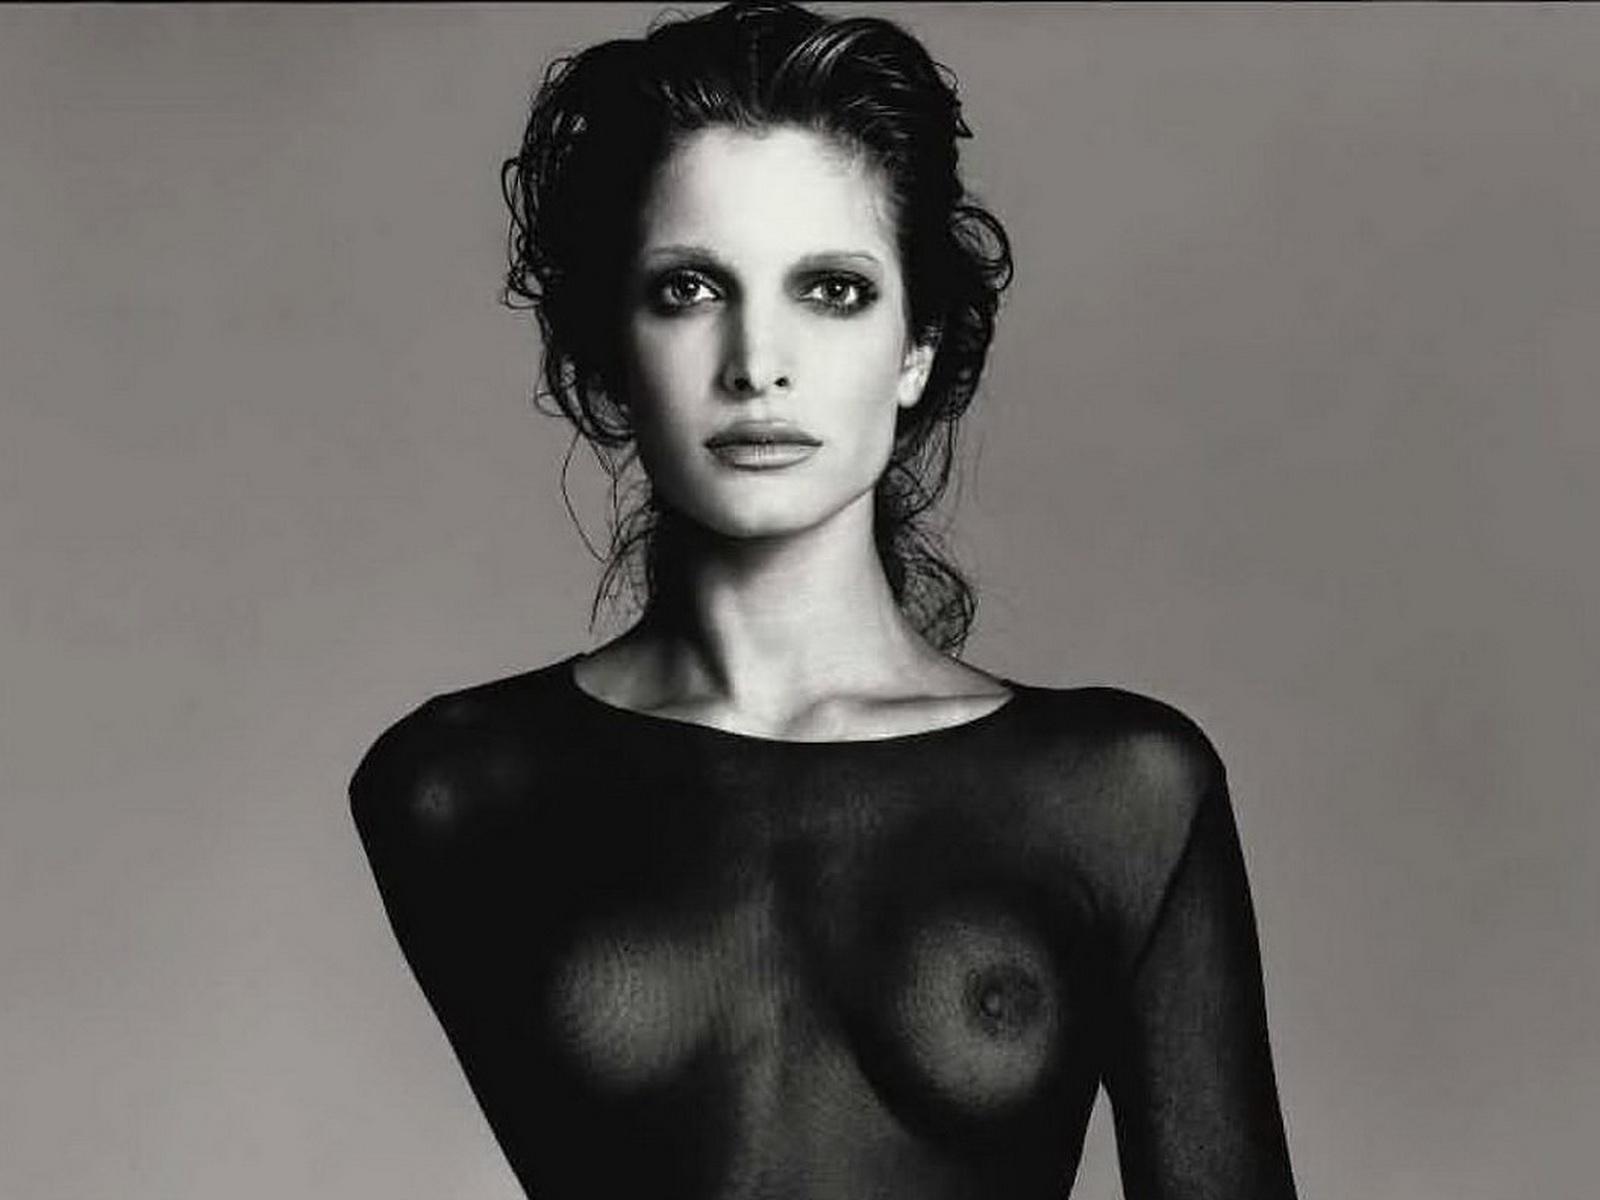 Stephanie Seymour nude Photo